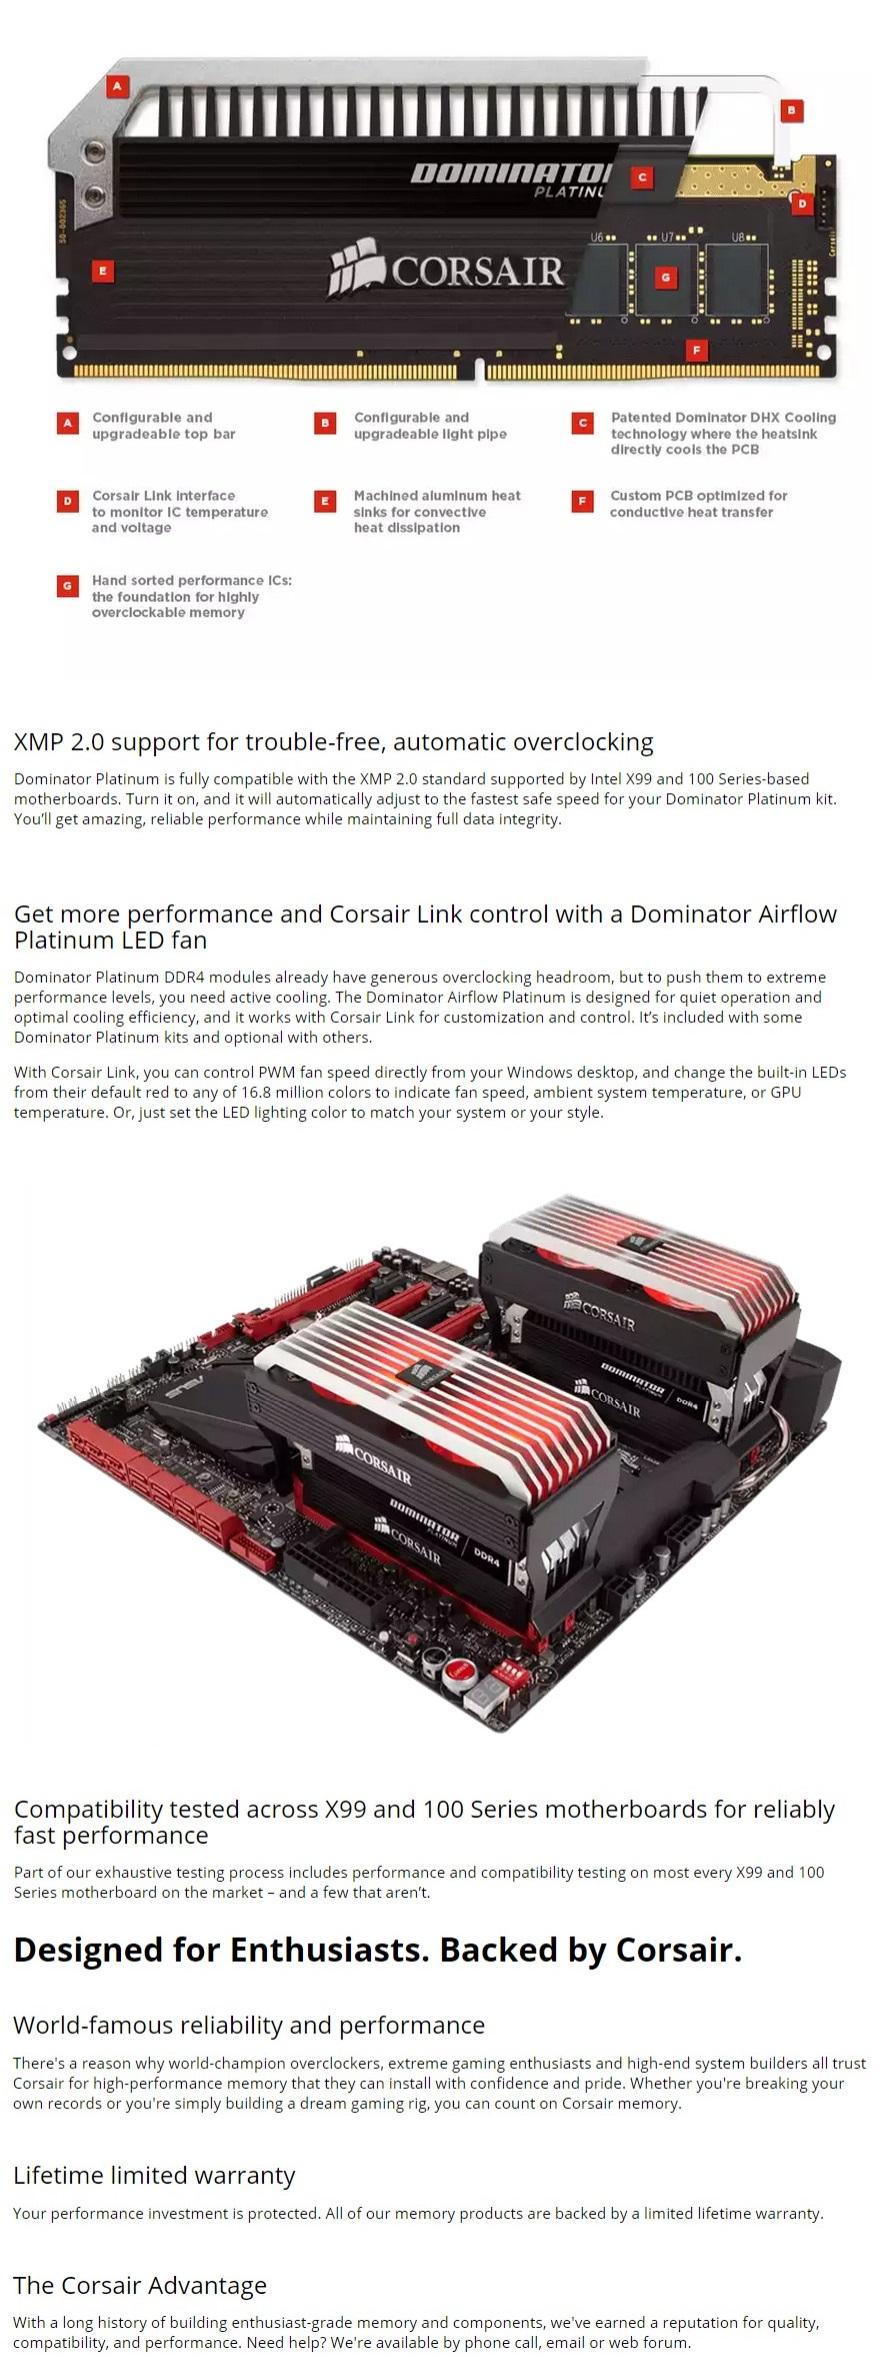 Corsair 16GB (2x8GB) CMD16GX4M2B3000C15 DDR4 3000MHz DOMINATOR PLATINUM 6th  Gen DIMM 15-17-17-35